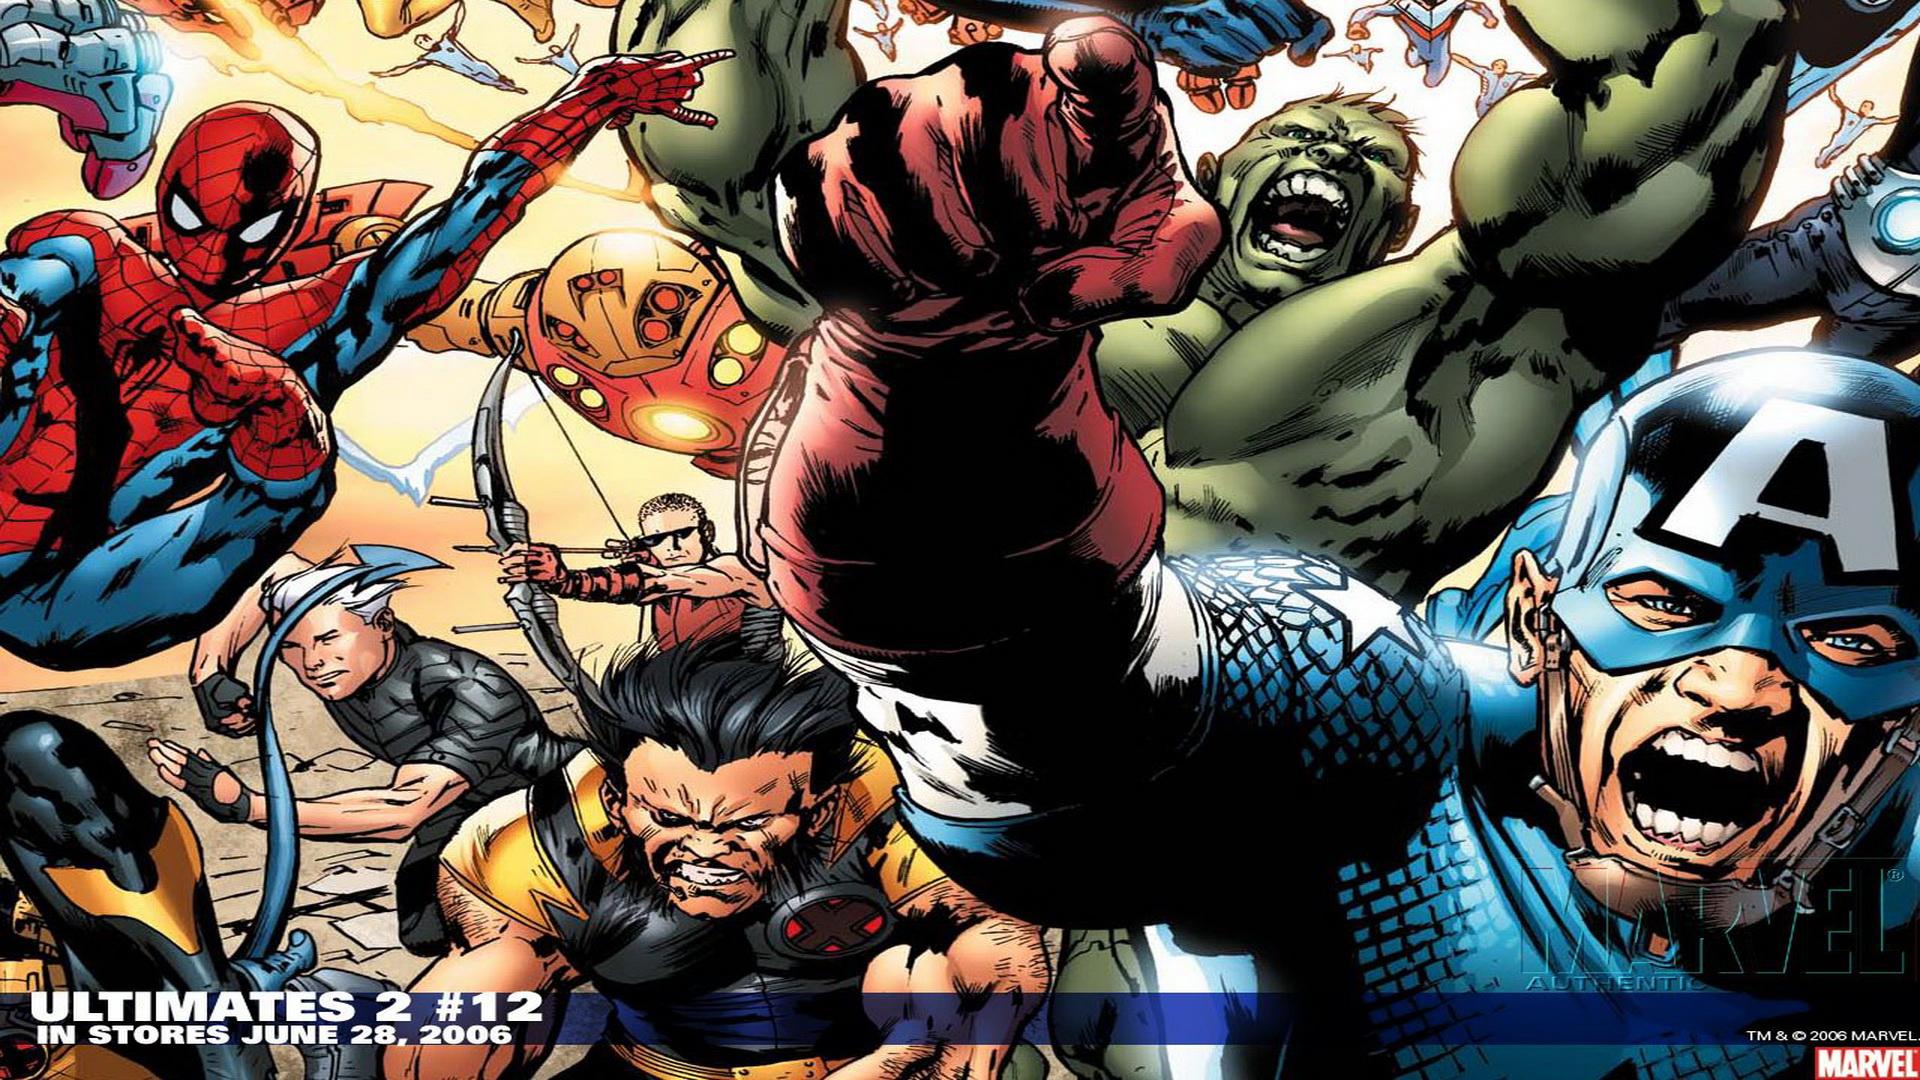 47 Marvel Comics Hd Wallpaper On Wallpapersafari